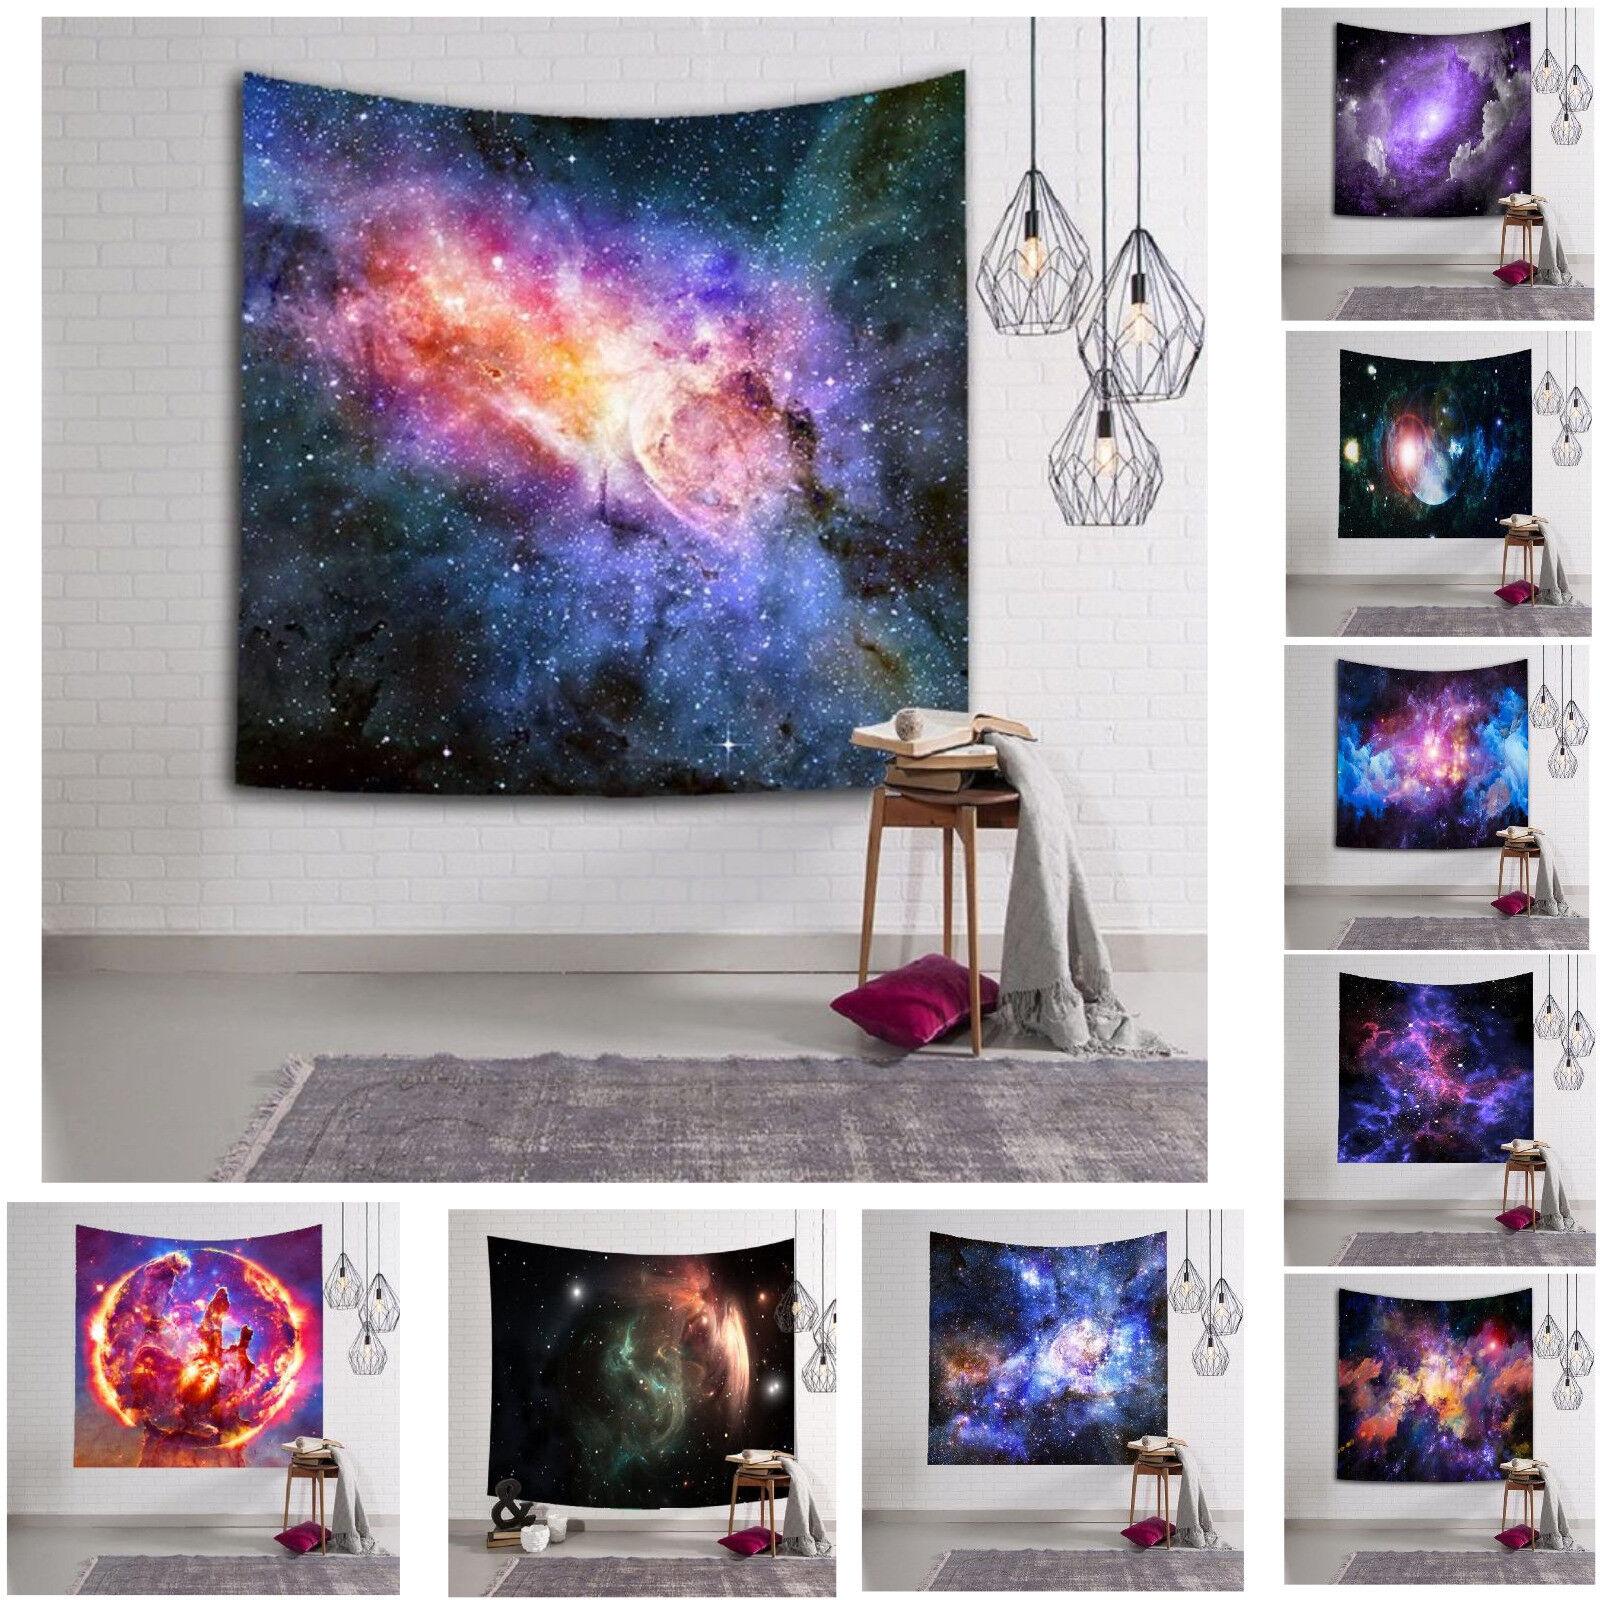 Beach Towels Galaxy Digital Printing Tapestry Hanging Wall H